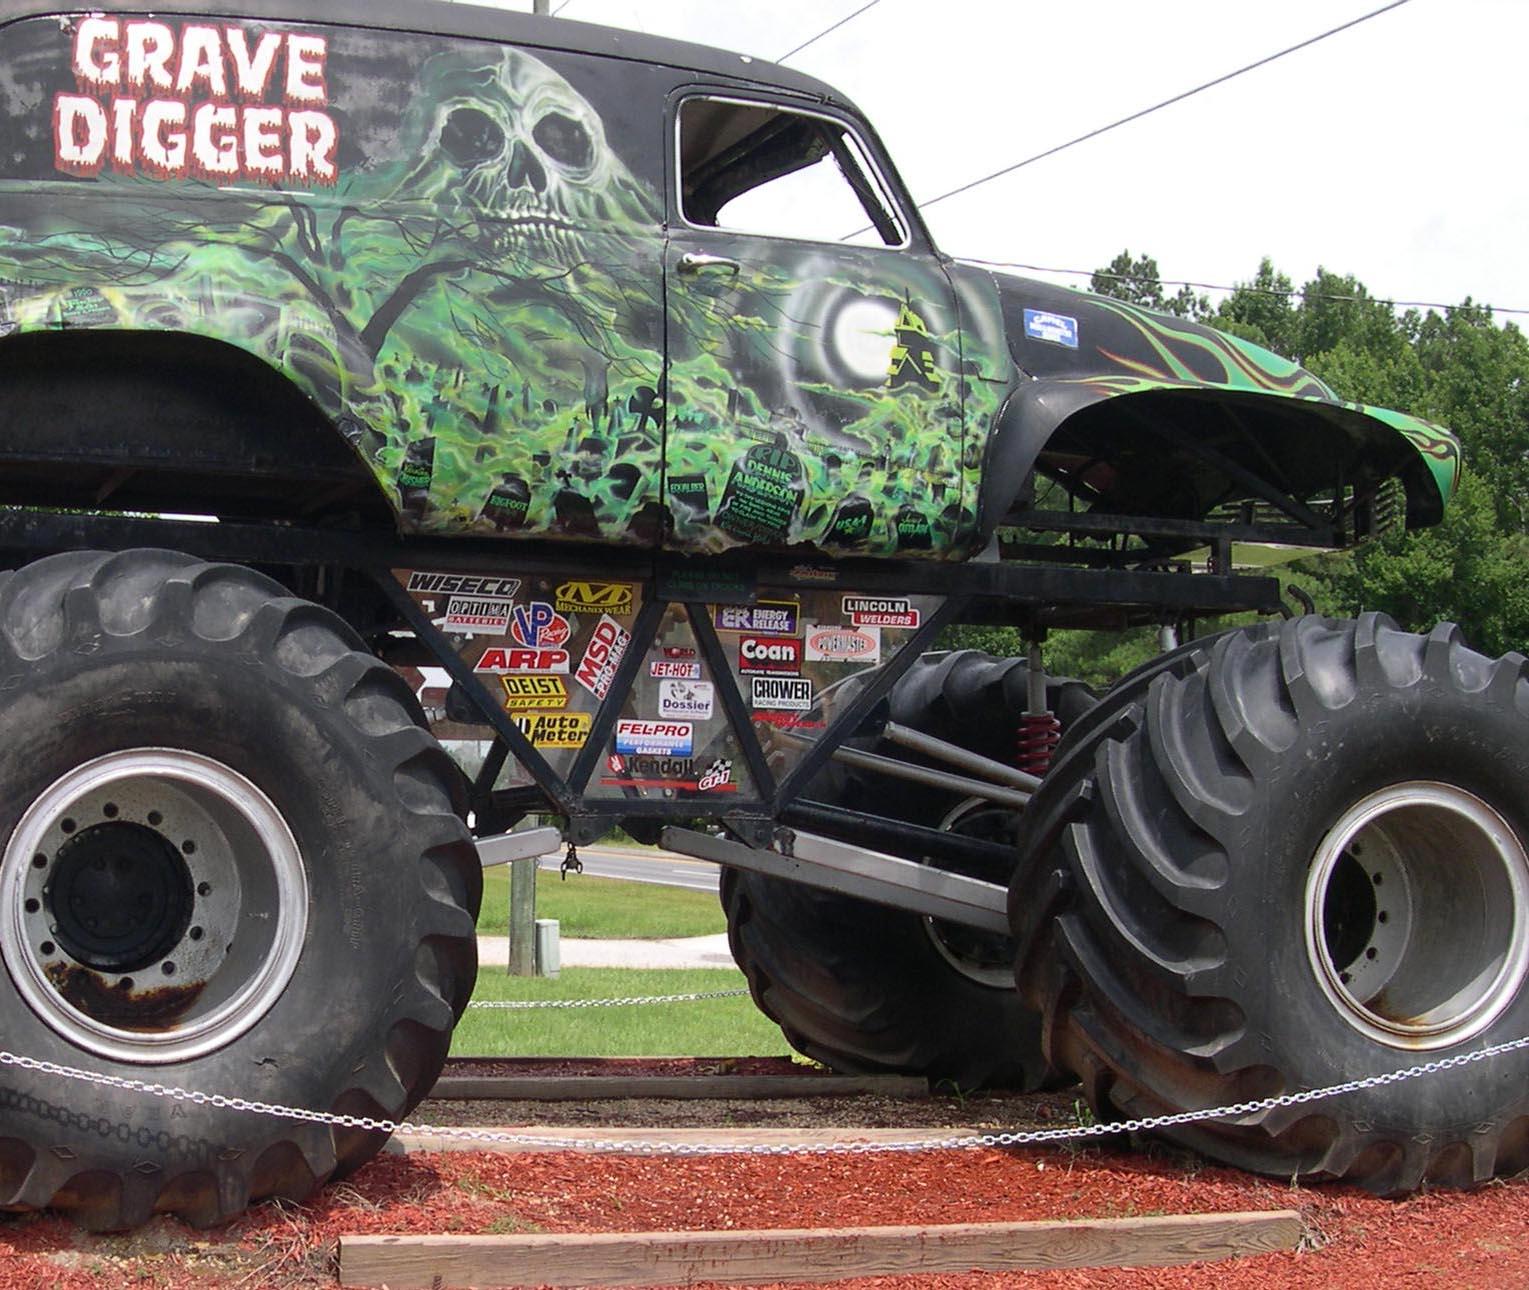 Grave Digger Monster Truck 4x4 Race Racing Monster Truck Hs